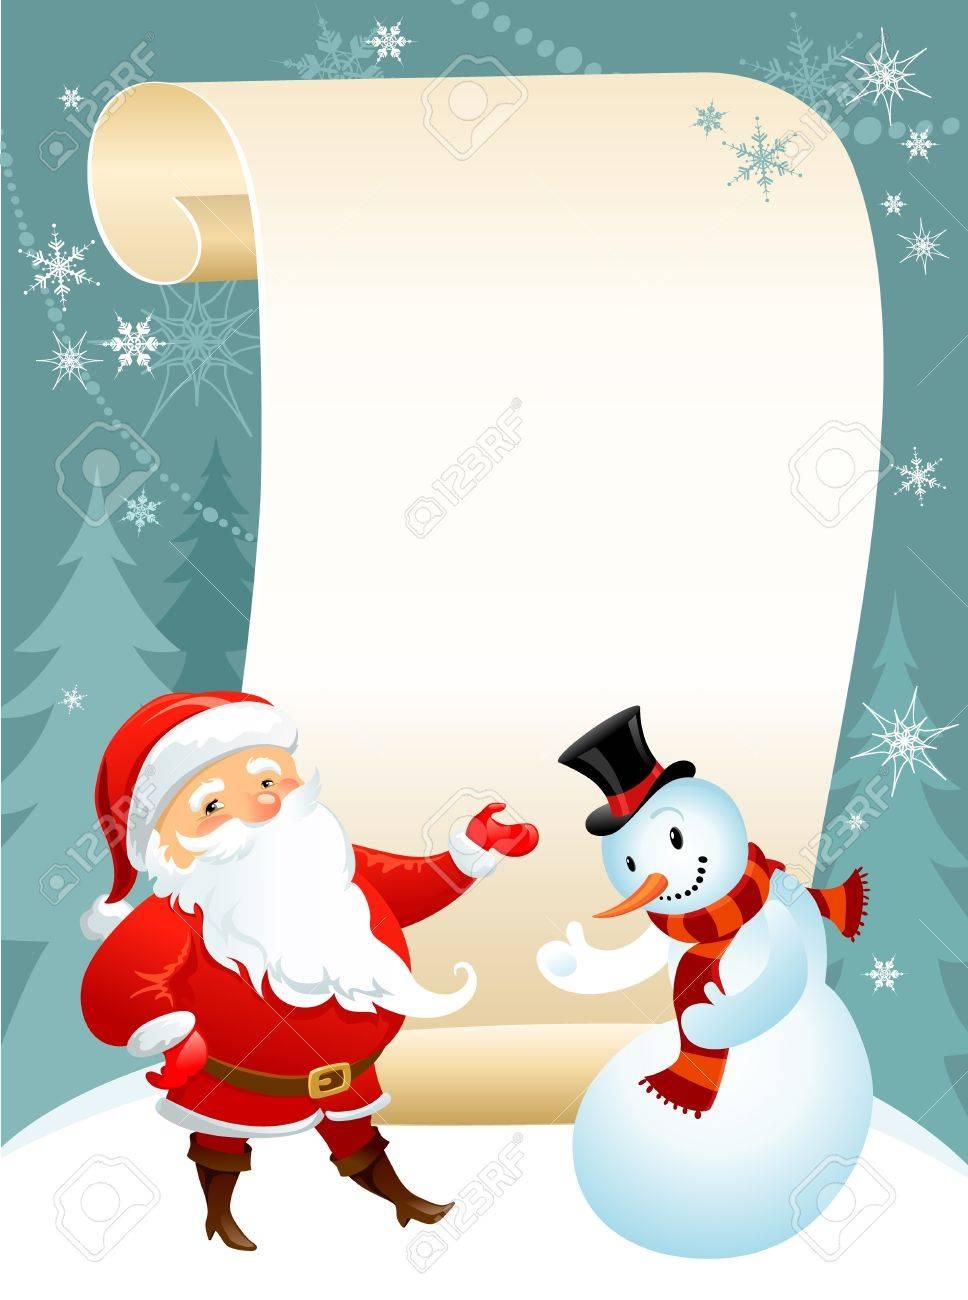 snowman and Santa Stock Vector - 9580911